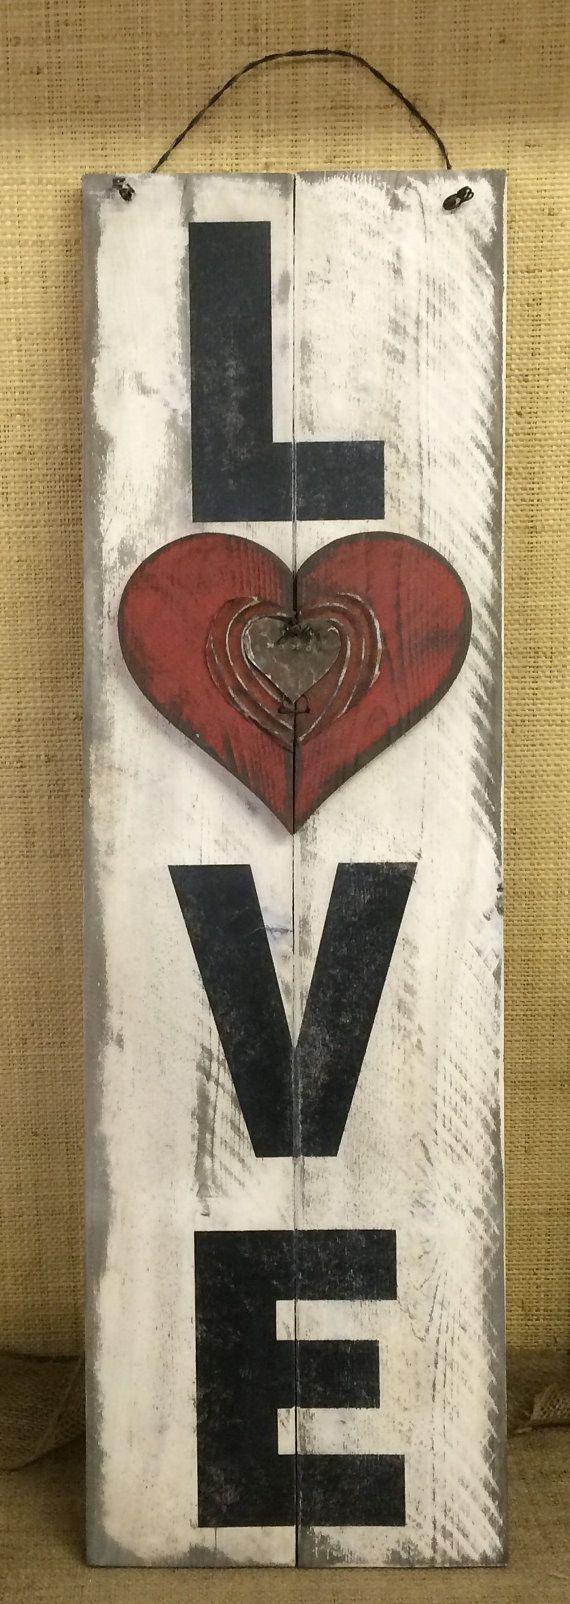 Love / Valentine's Day Sign Handmade & Painted por Chotchkieville